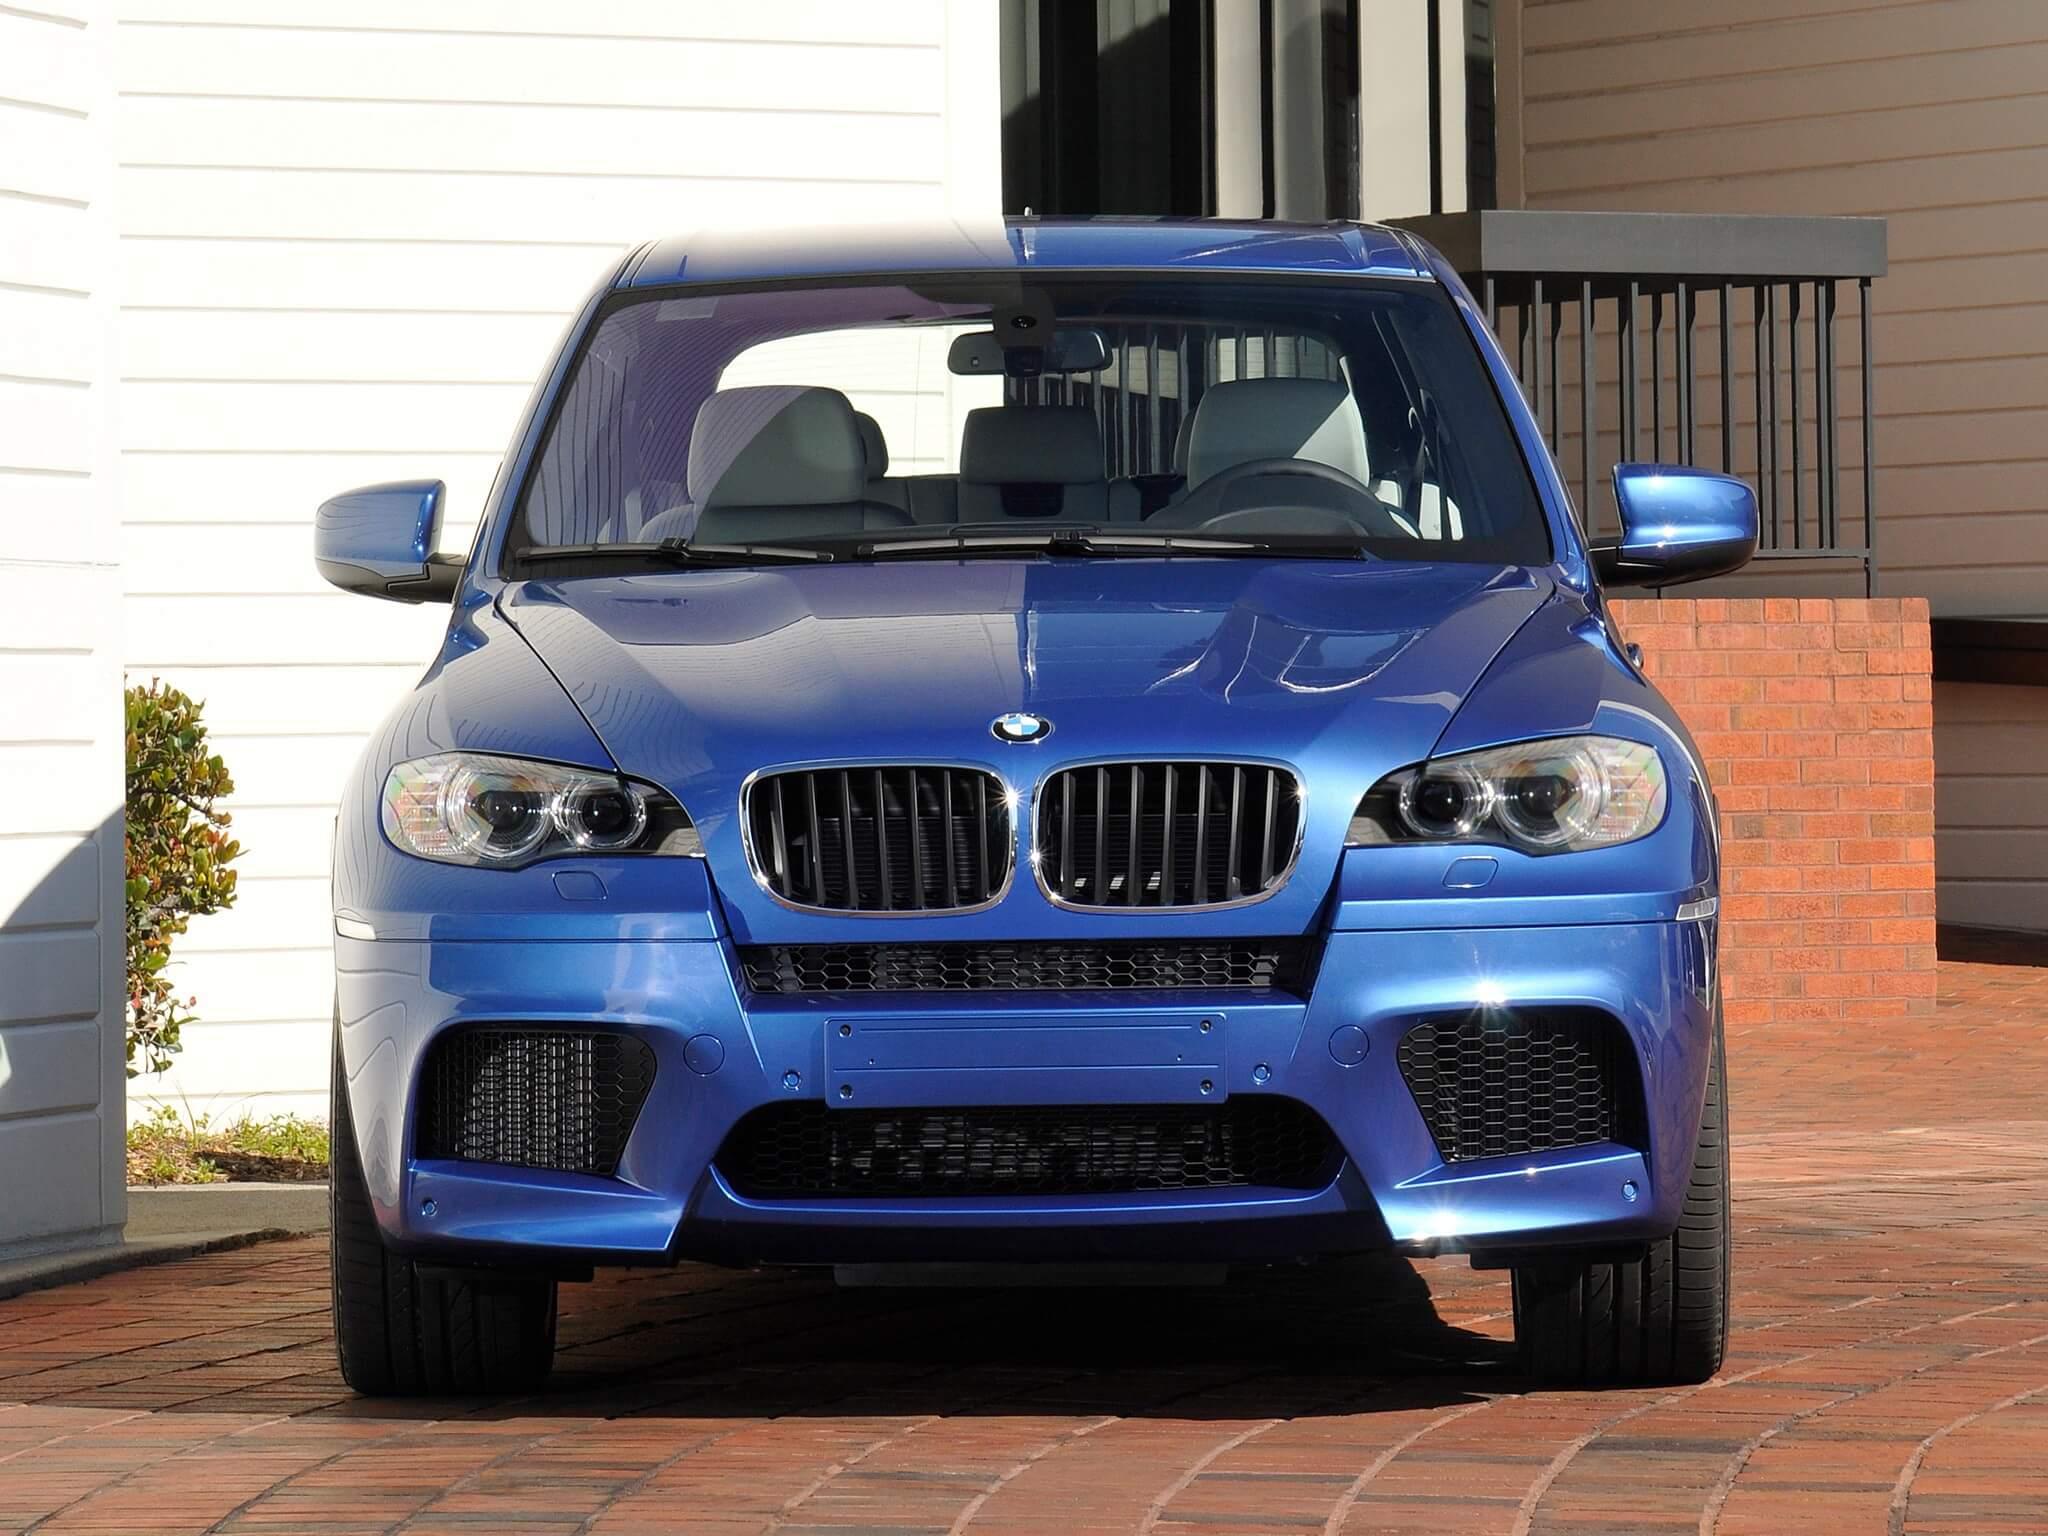 BMW-X5-E70-7.jpg